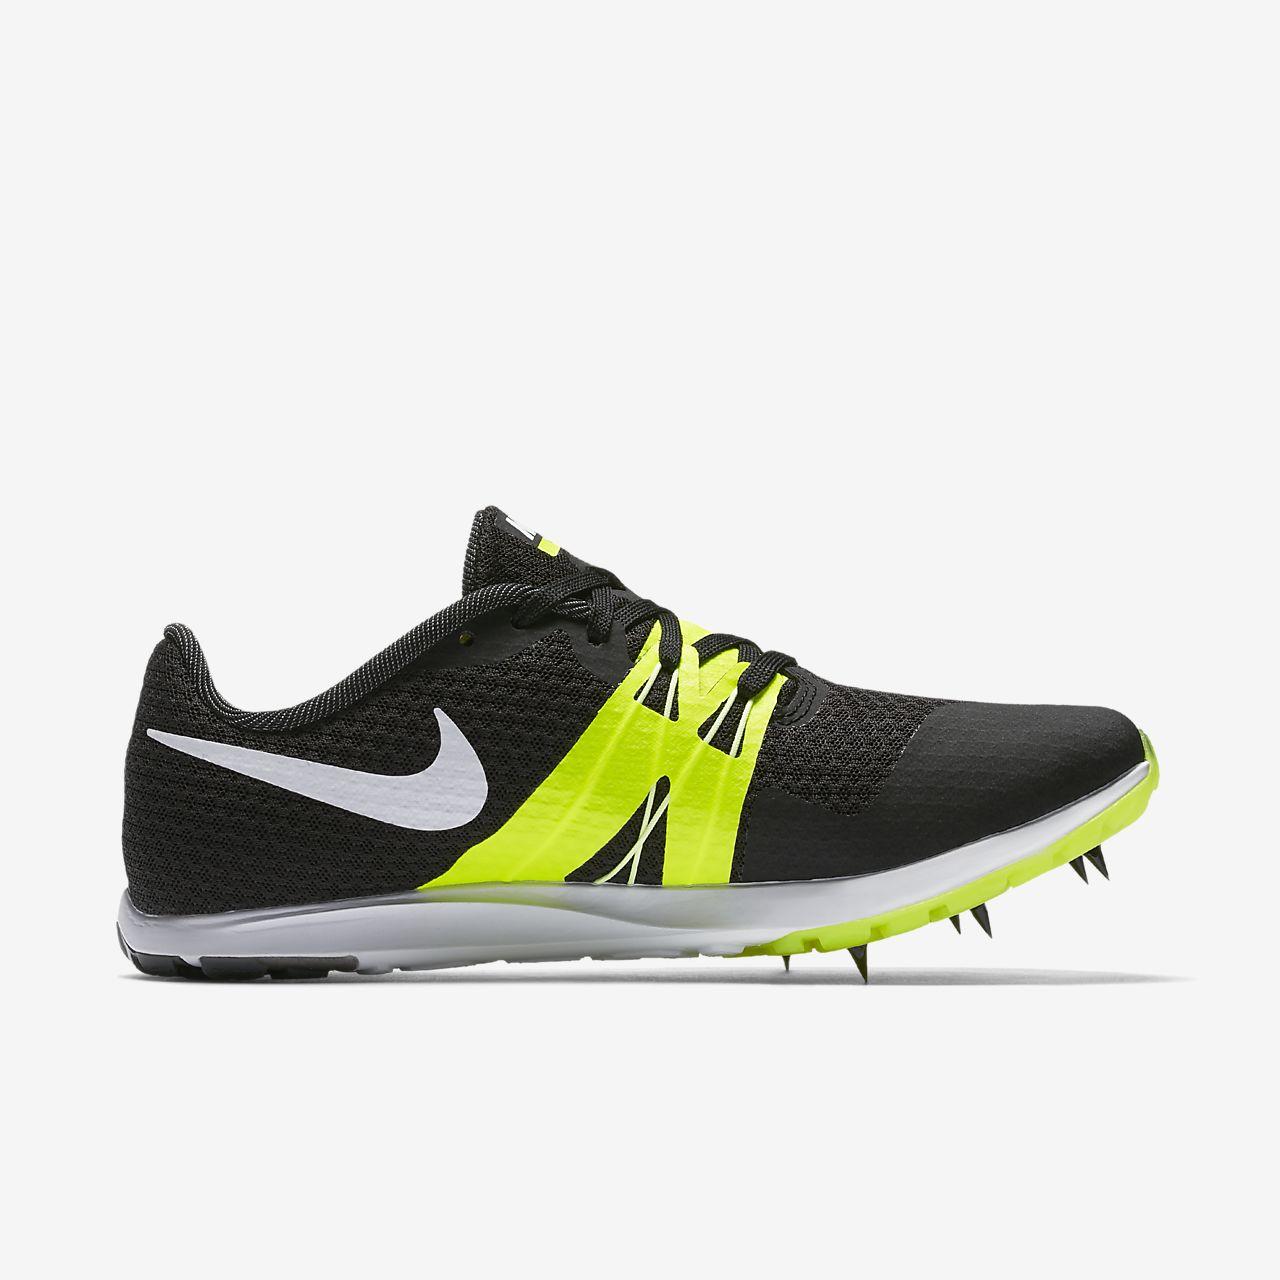 86a43ead75241 ... Nike Zoom Rival XC Womens Track Shoe .